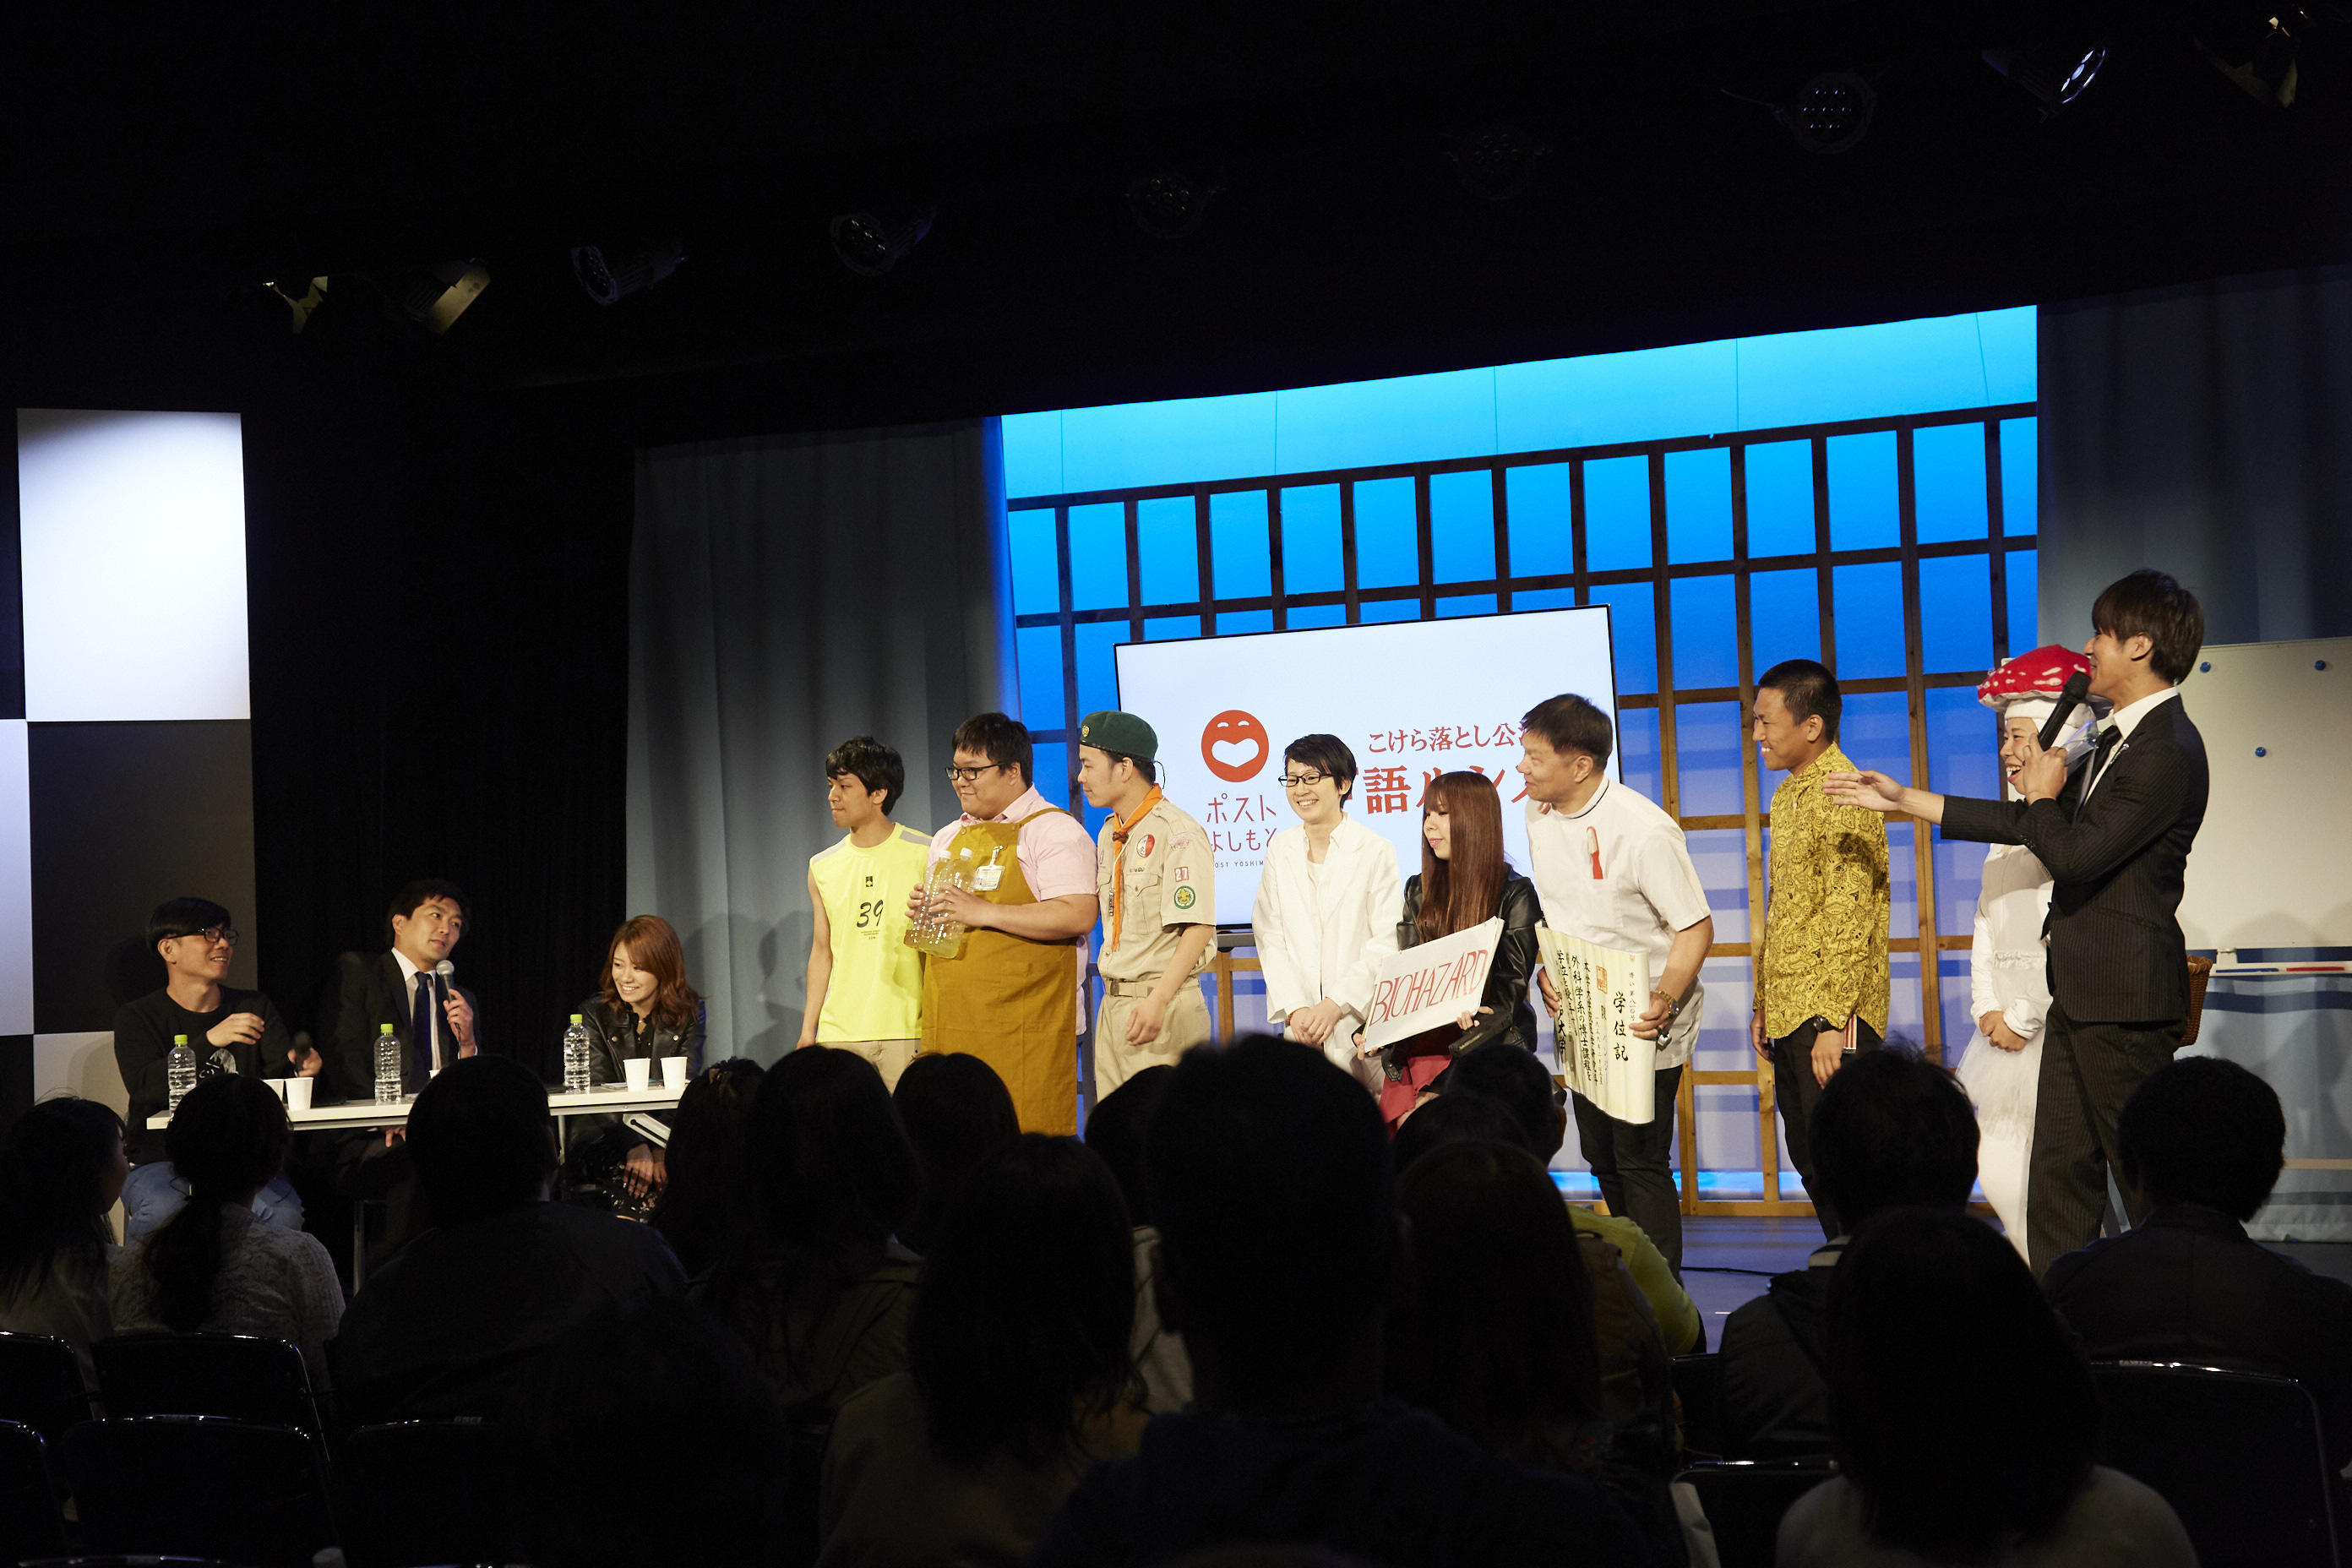 http://news.yoshimoto.co.jp/20180401095900-9f86888c37263aa20d6cb0cd9685900612d0a58c.jpg